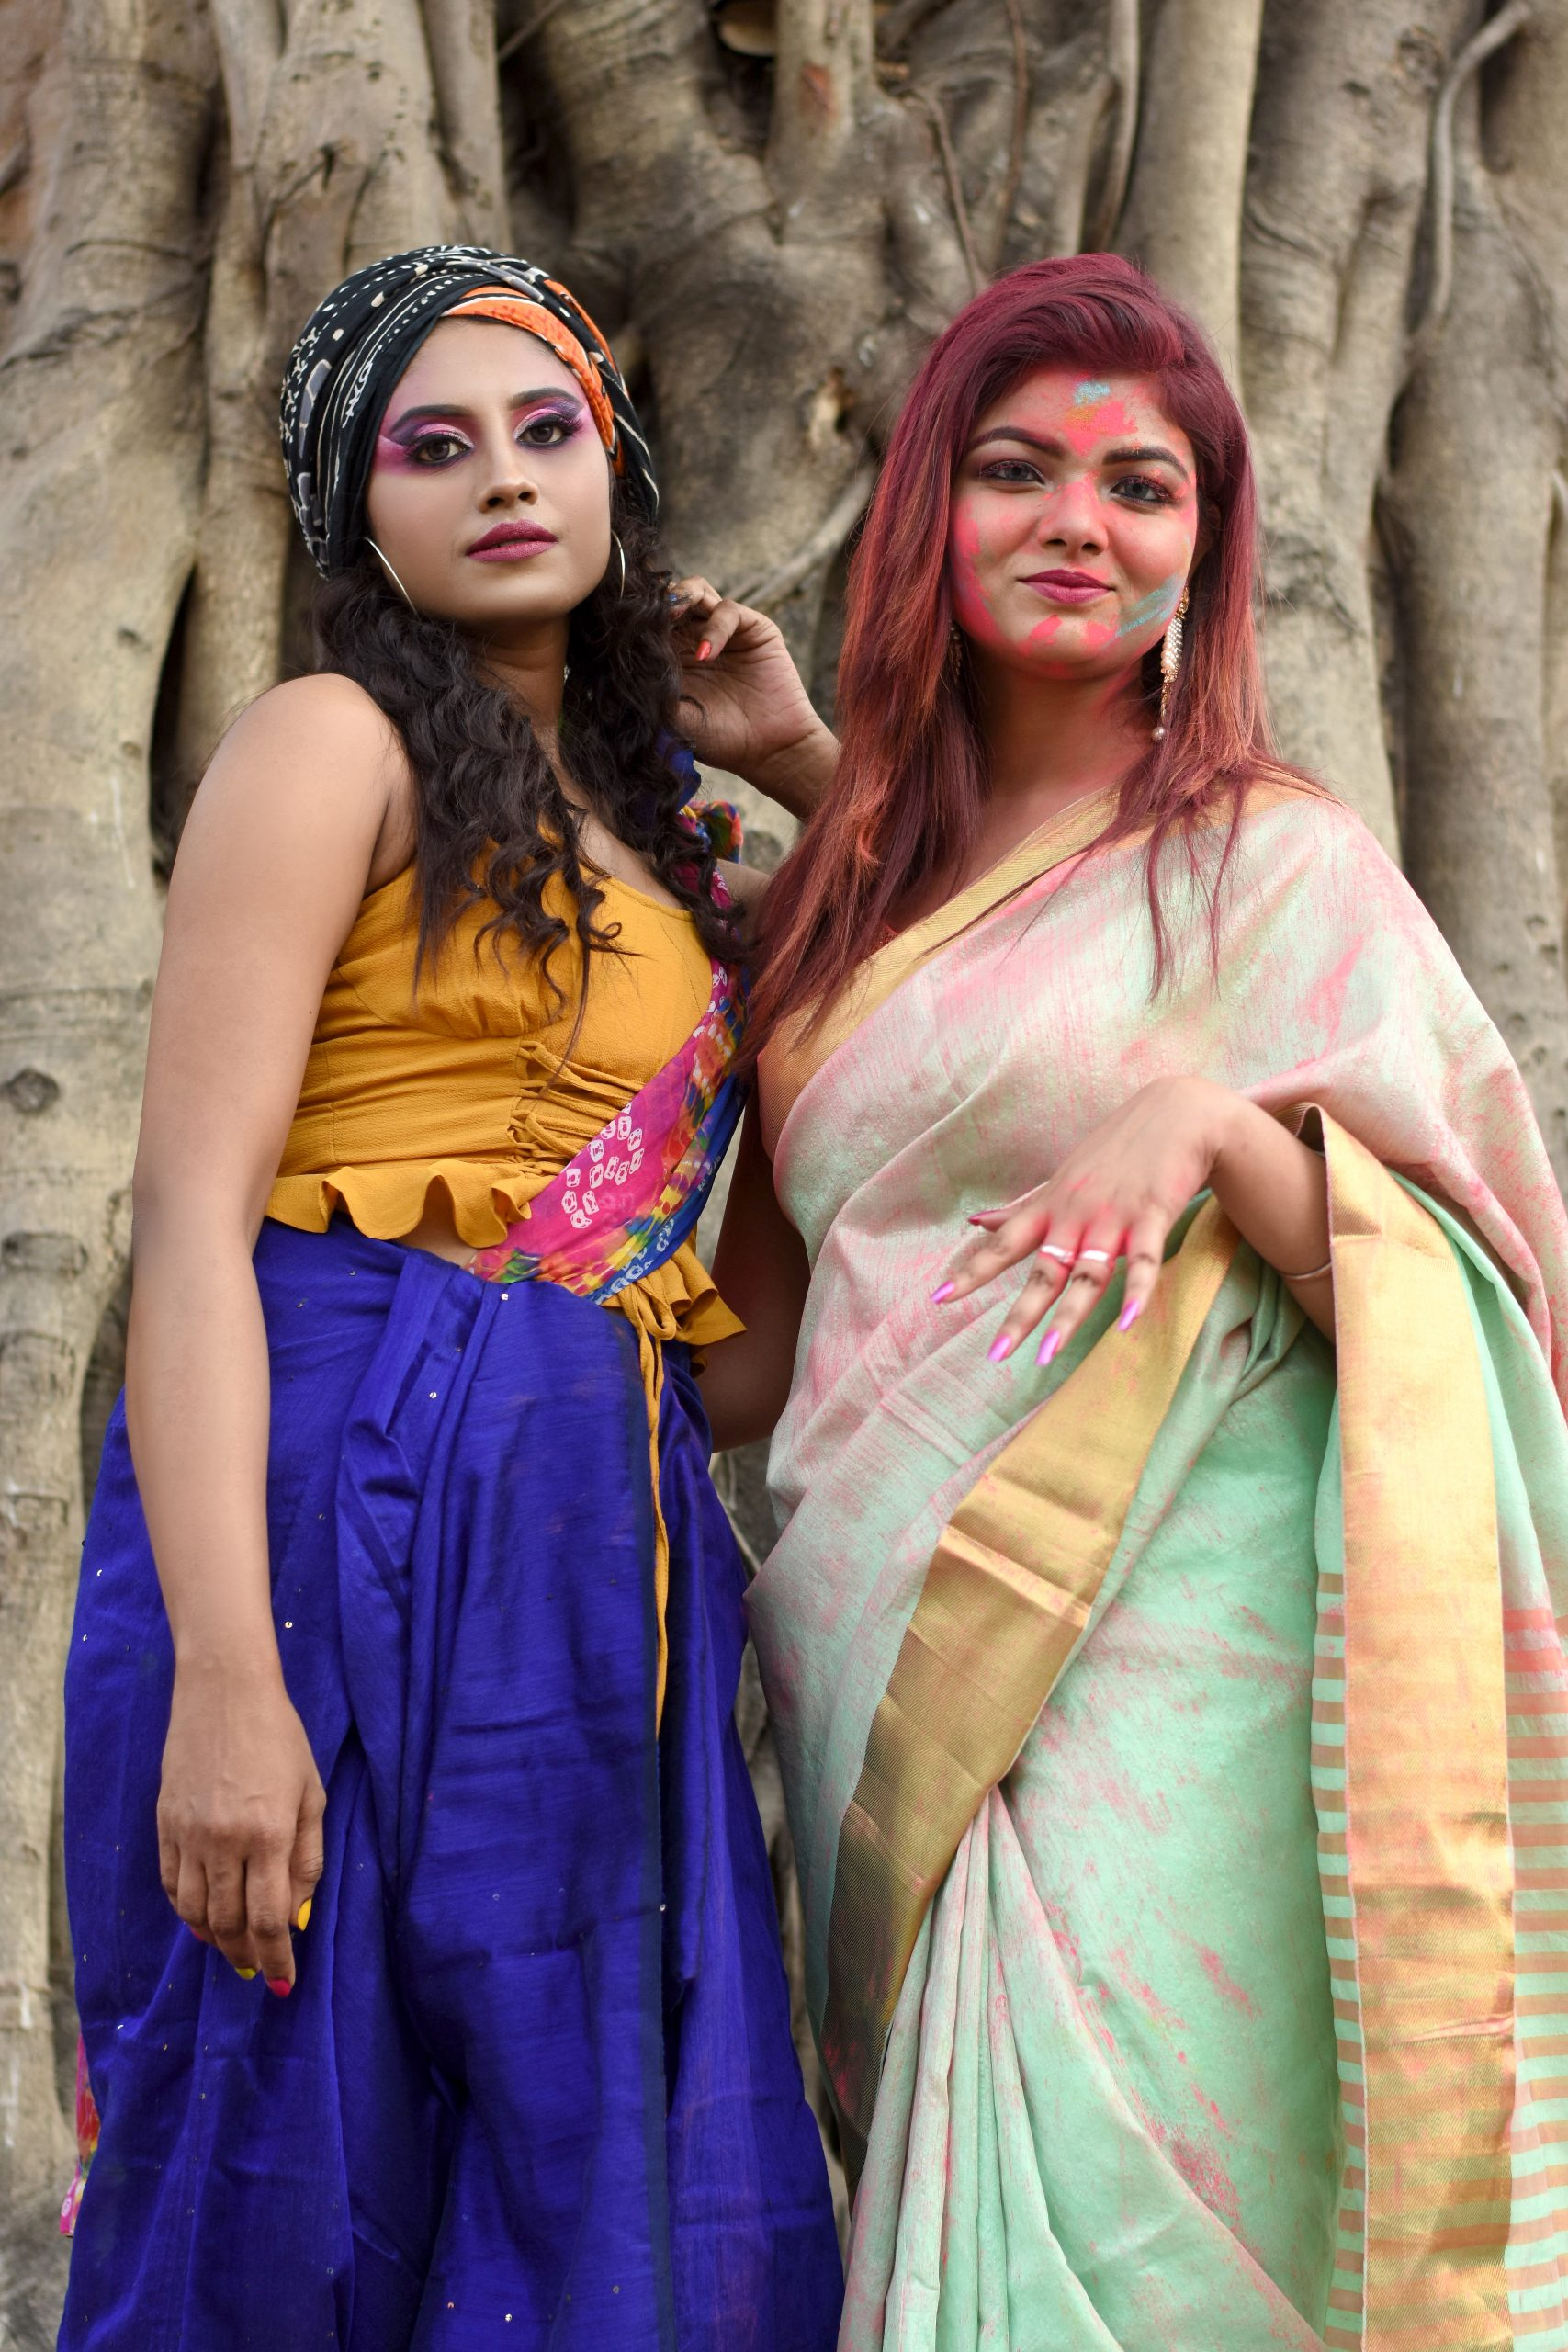 Two girls during Holi festival